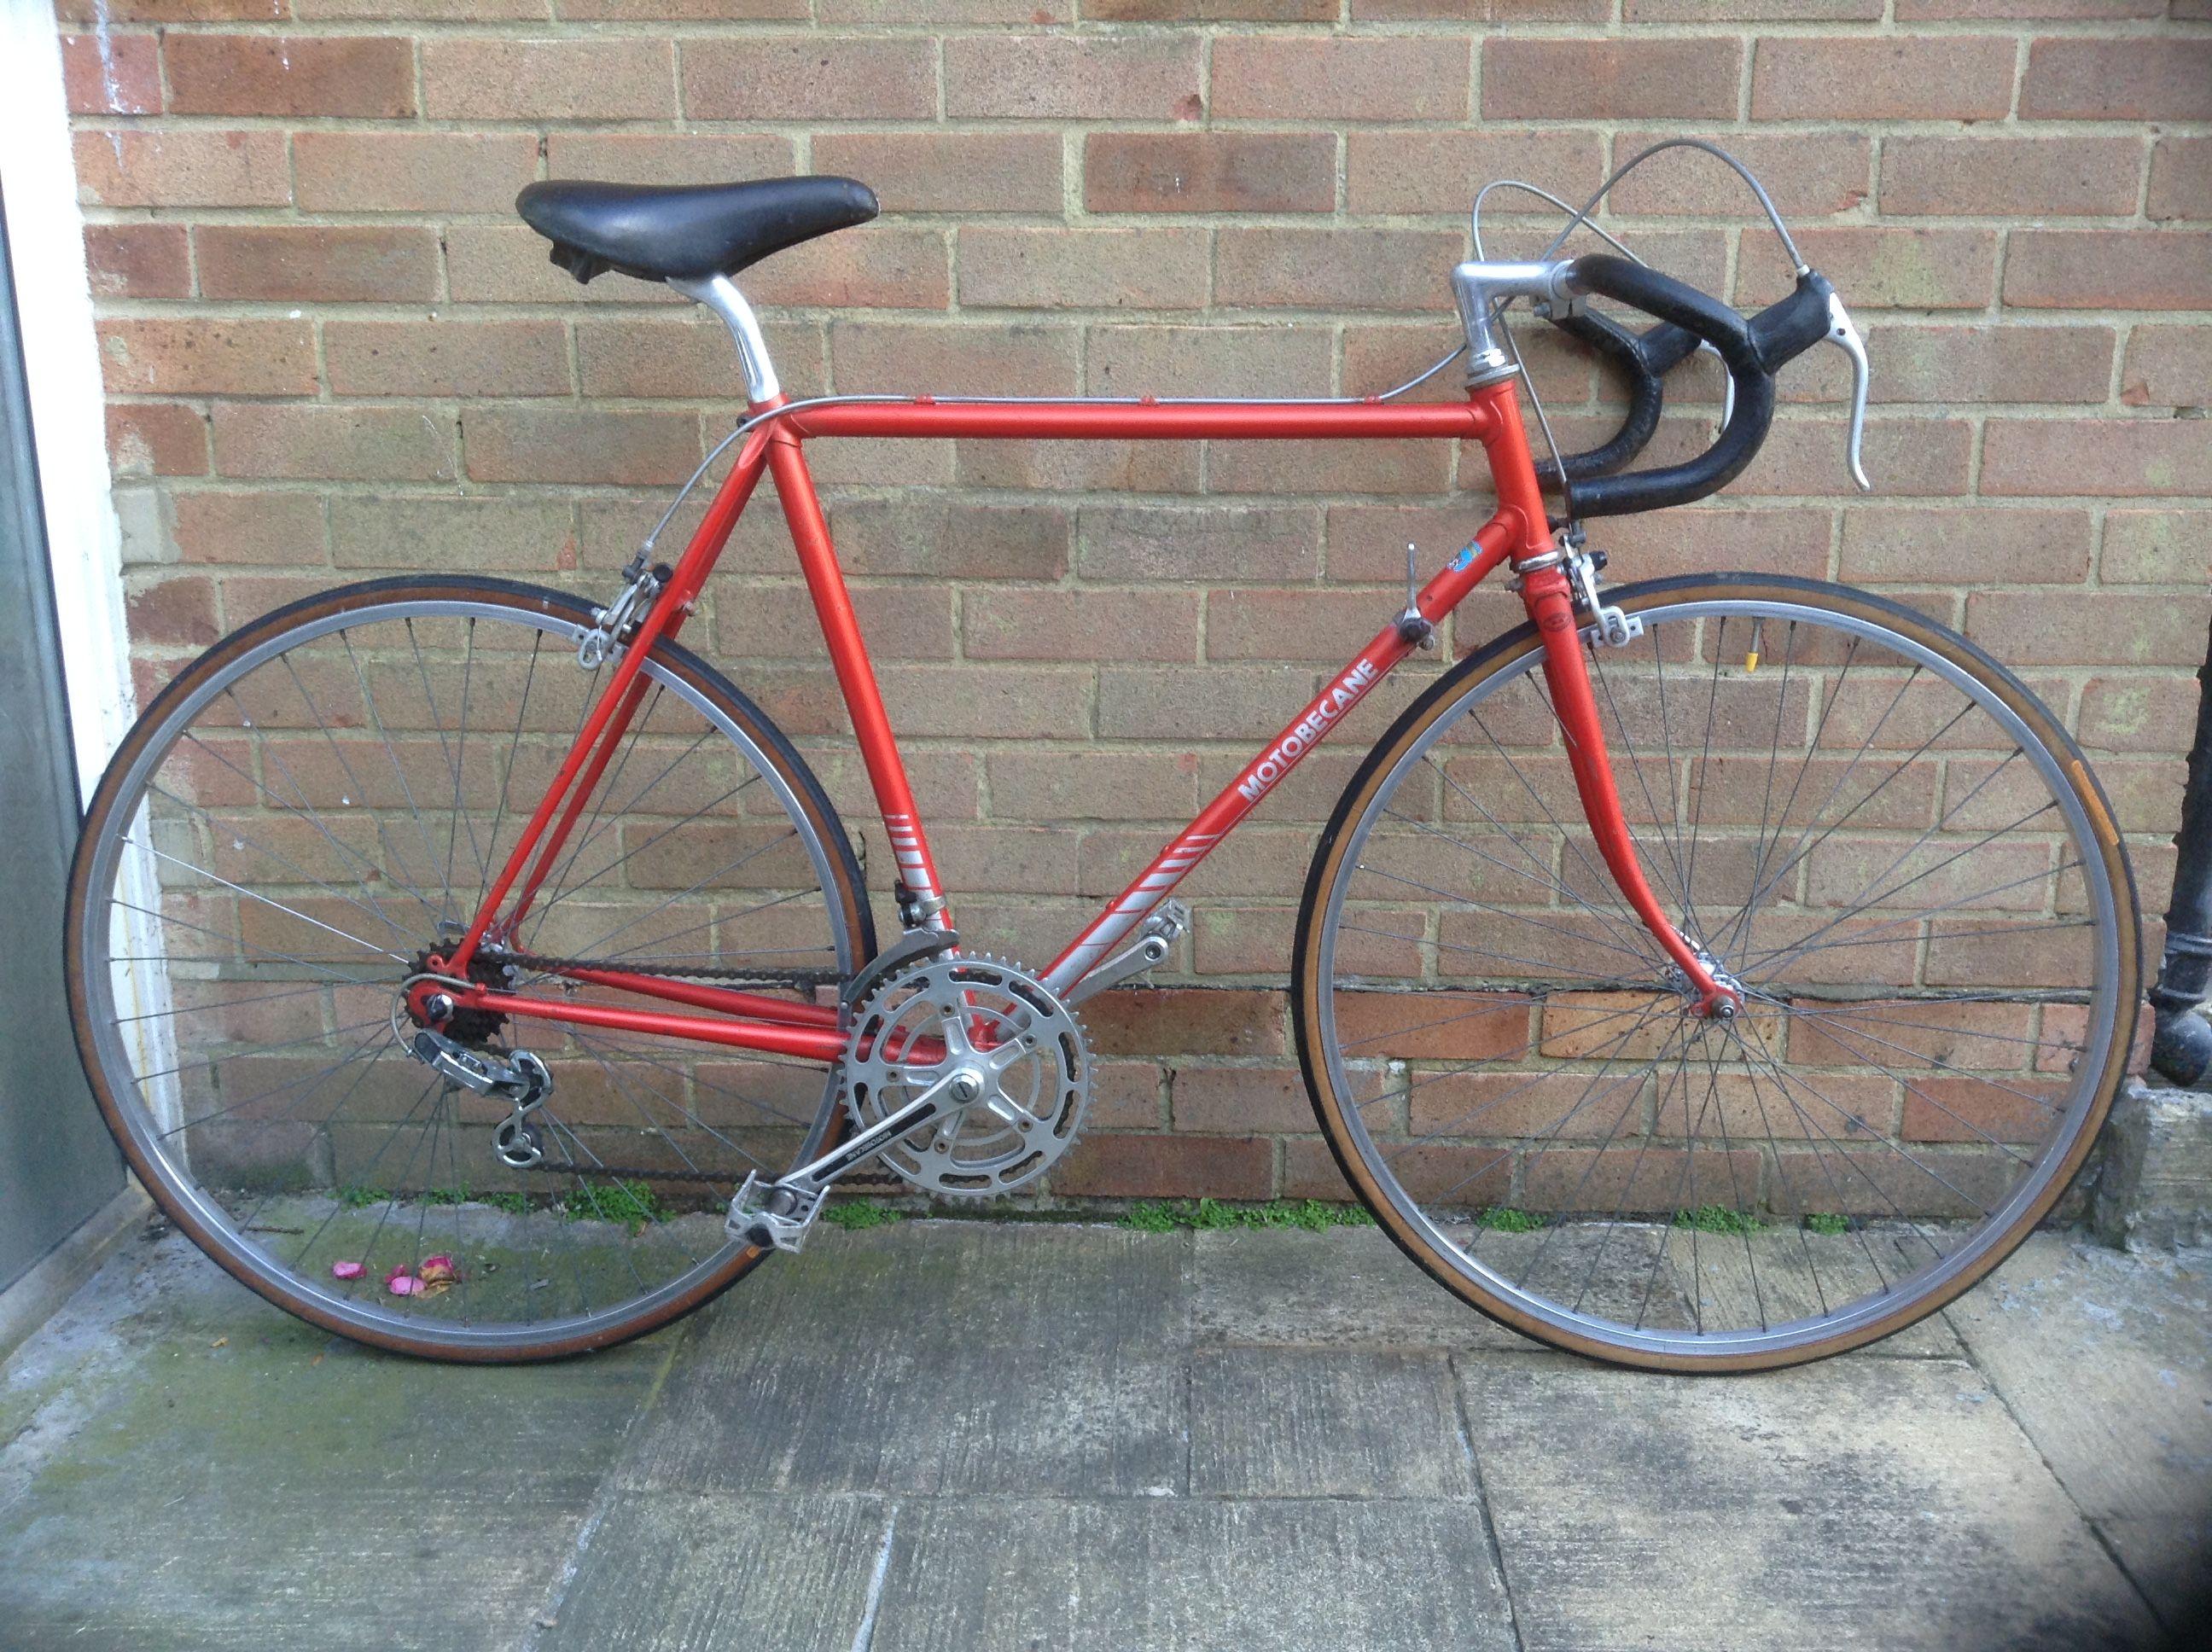 1978 Motobecane Grand Sprint C2 Vintage Road Bike Review Road